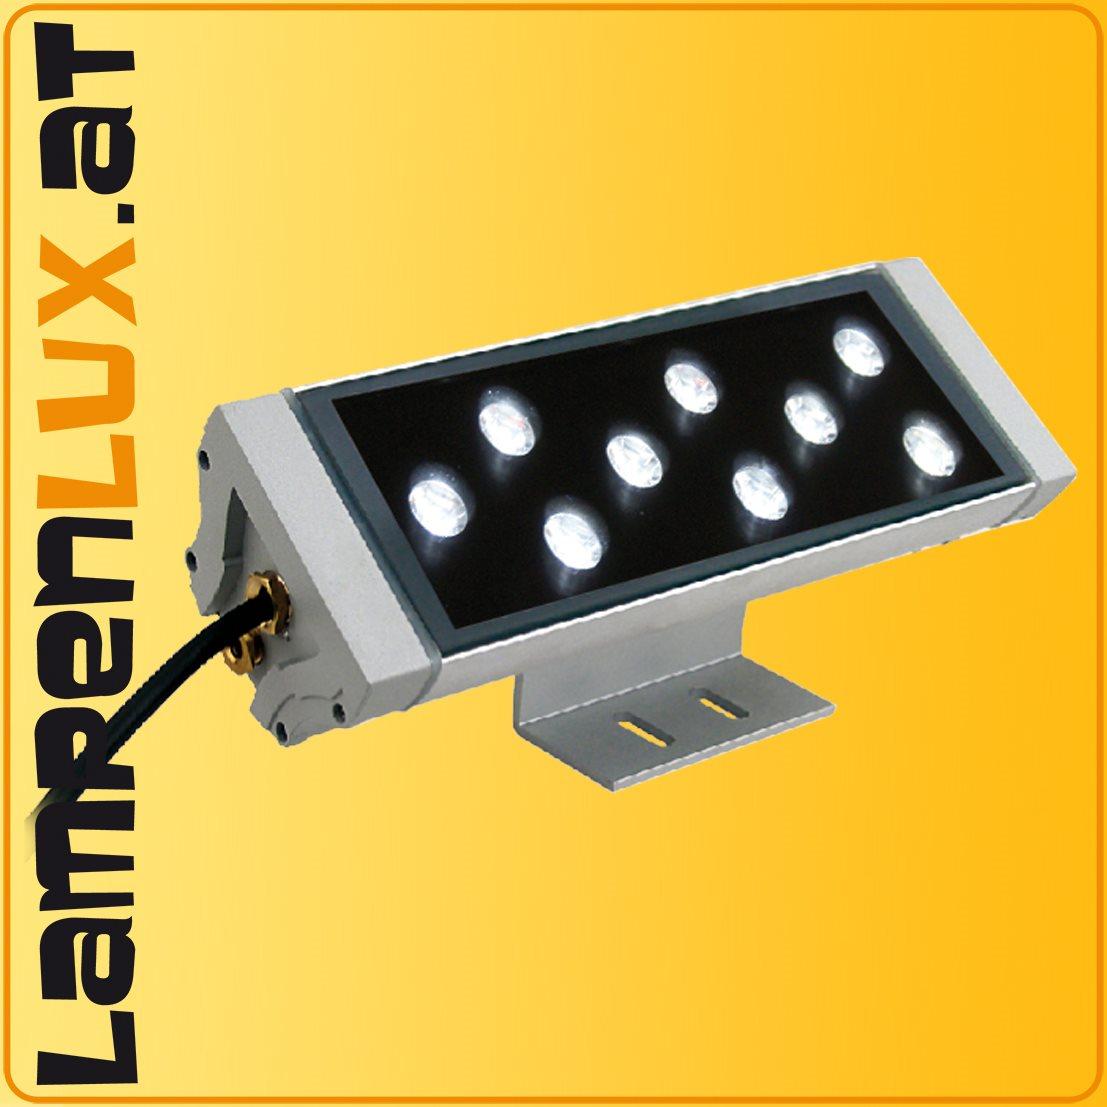 led aussenlampe objekt strahler aufbaustrahler aufbau leuchte lampe licht ip67 ebay. Black Bedroom Furniture Sets. Home Design Ideas